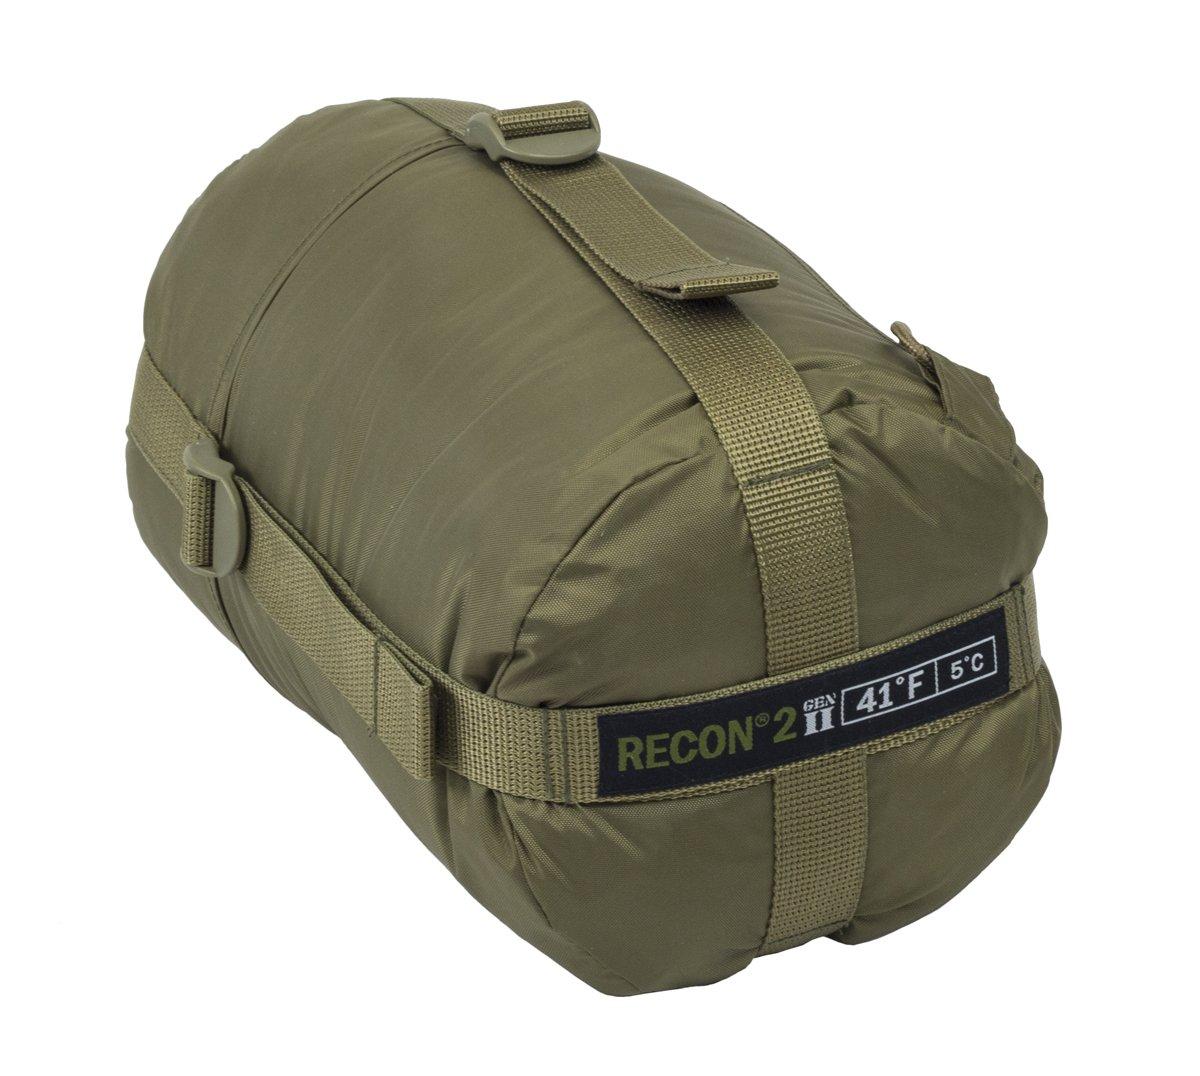 Elite Survival Systems Recon 2 Sleeping Bag